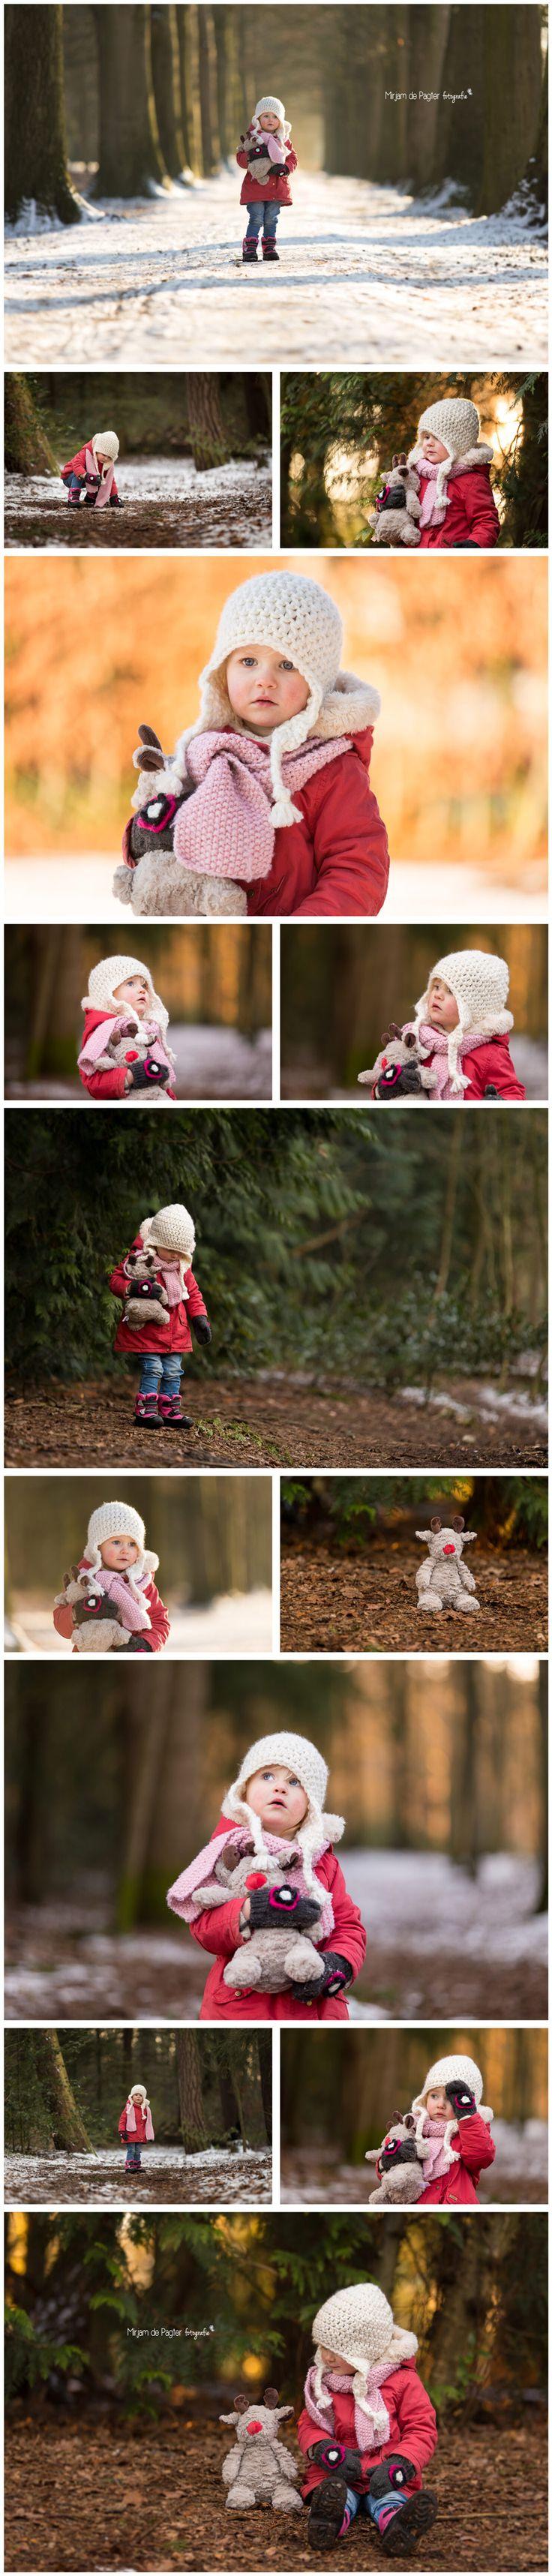 Winterse peuter fotoshoot in het bos ♡ | http://mirjamdepagter.nl/fotoshoots-blog/peuter-in-het-winterbos/ | Mirjam de Pagter Fotografie #kinderfotografie #peuter #winter #bos